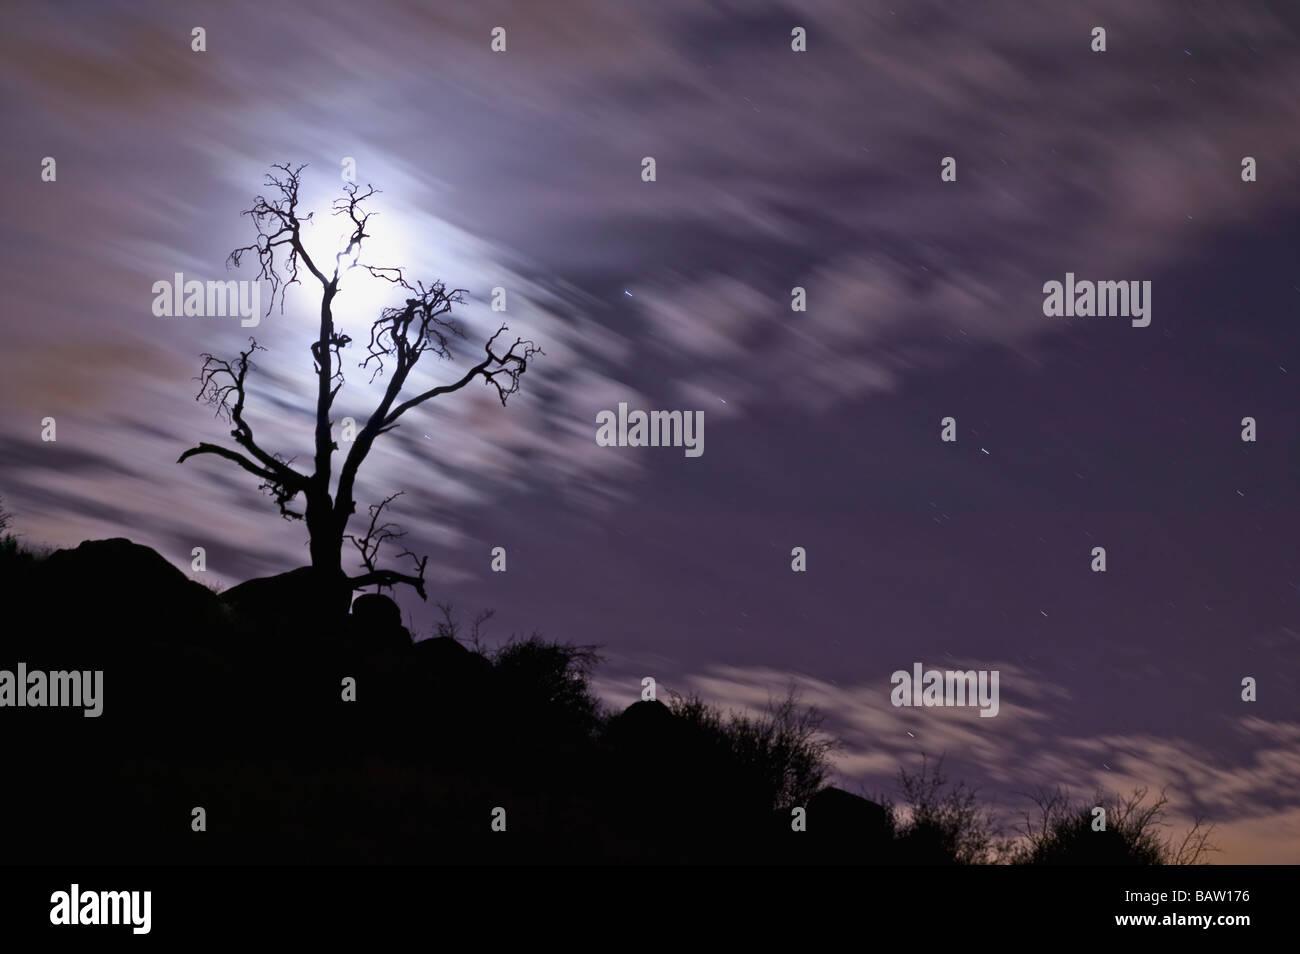 Full moon behind bare tree - Stock Image